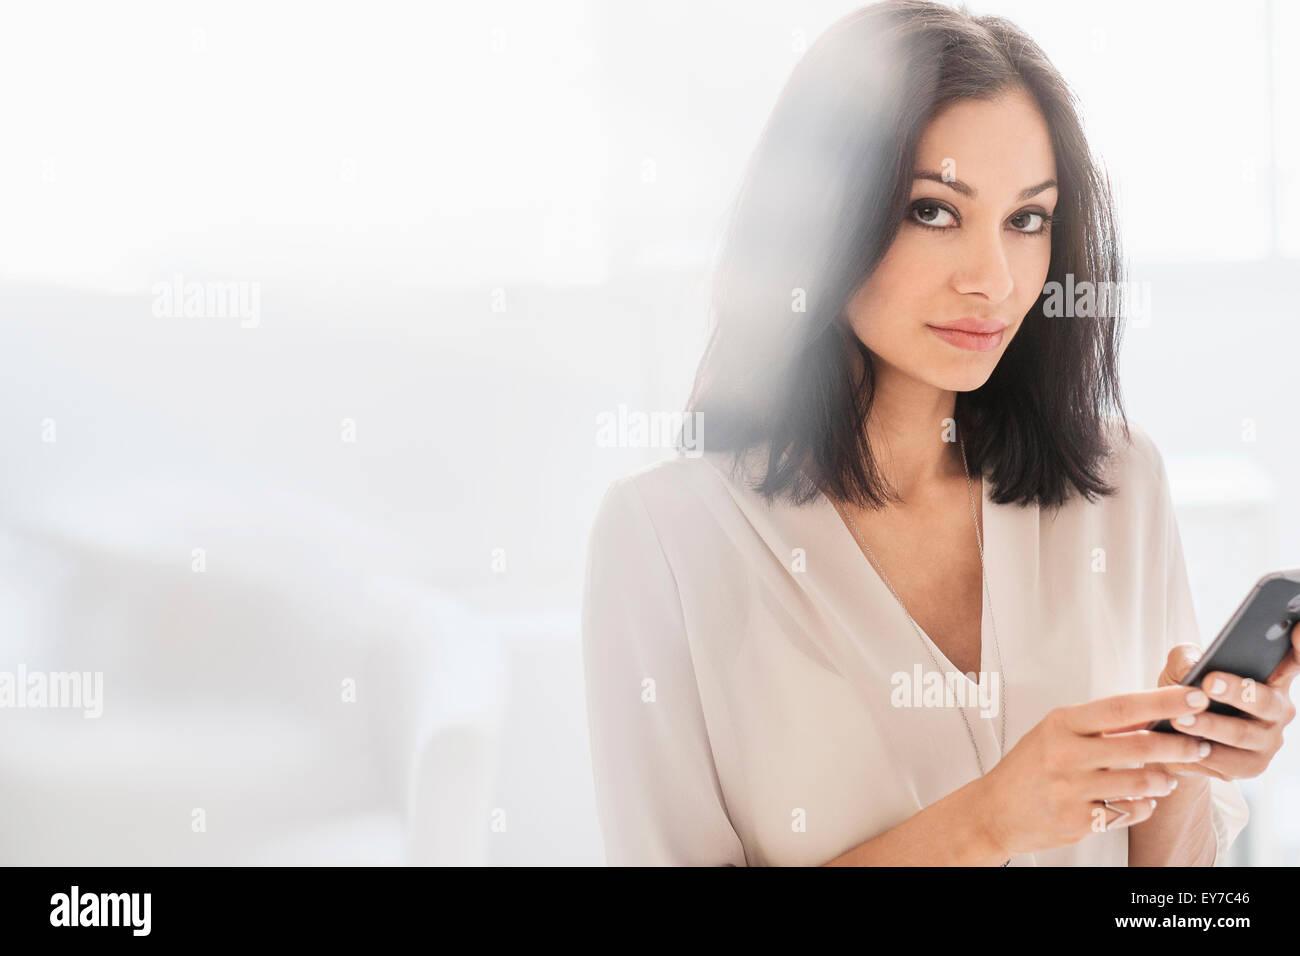 Woman using smart phone - Stock Image